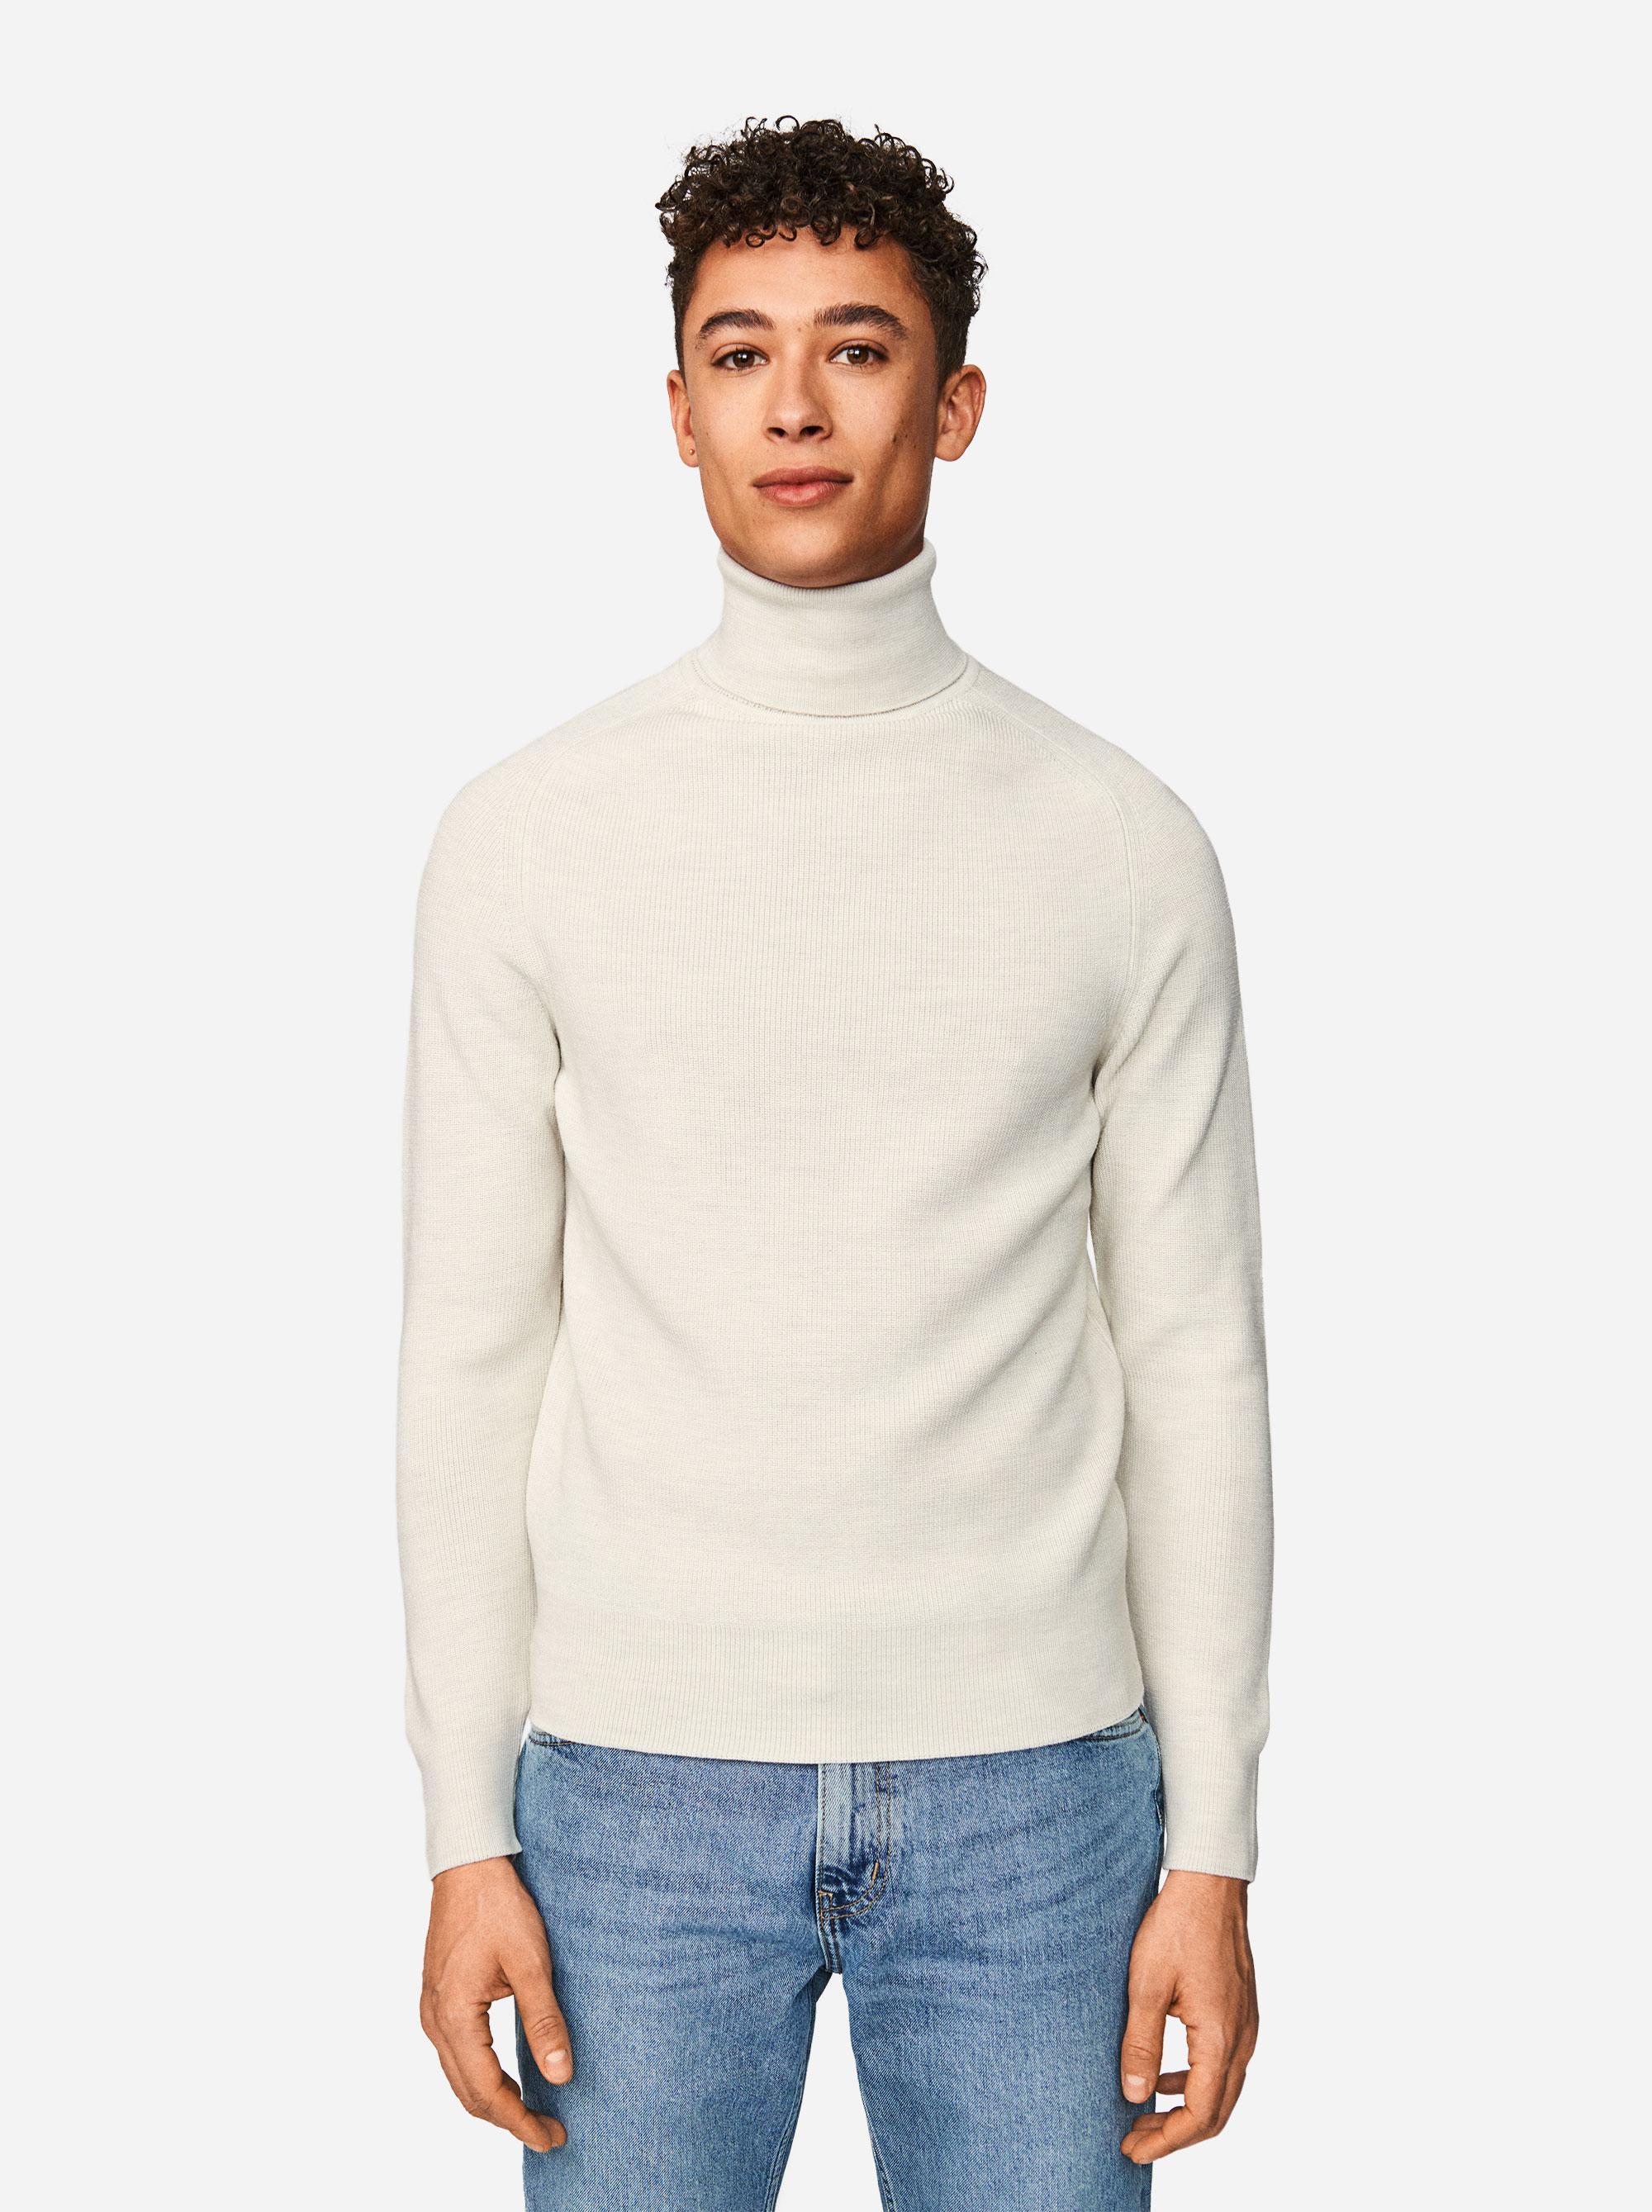 Teym - Turtleneck - The Merino Sweater - Men - White - 1